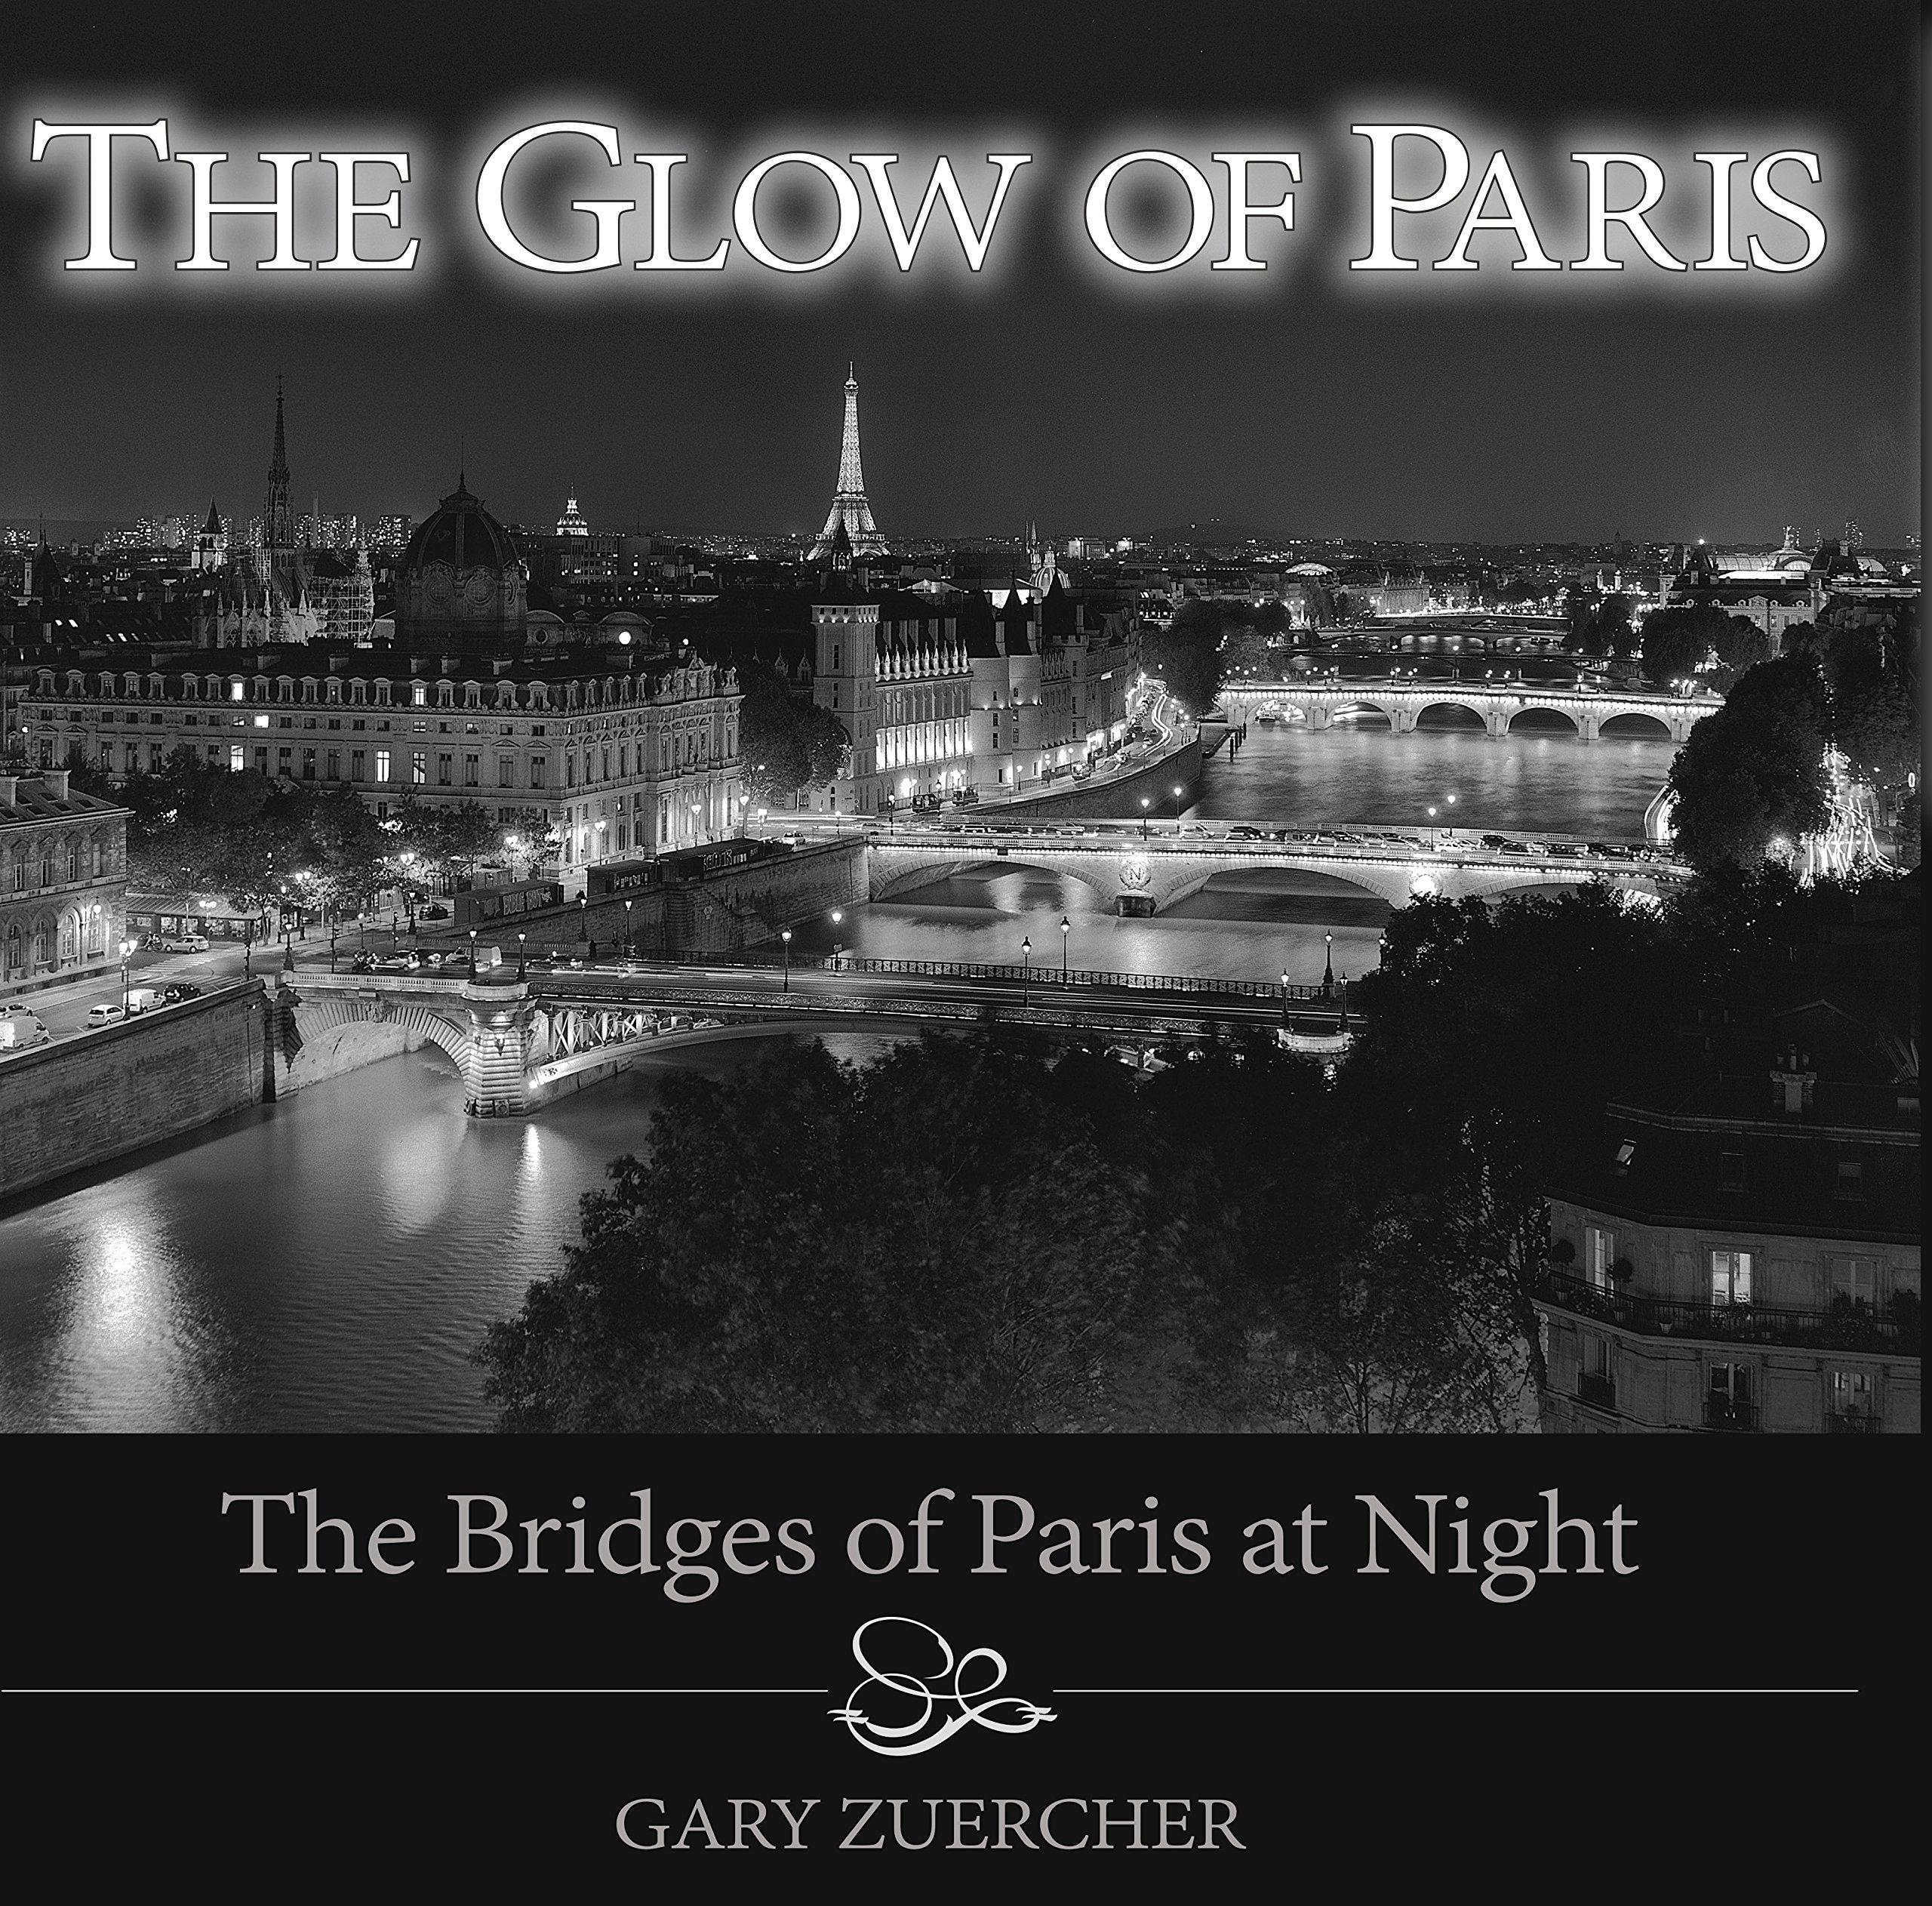 Download The Glow of Paris: The Bridges of Paris at Night PDF